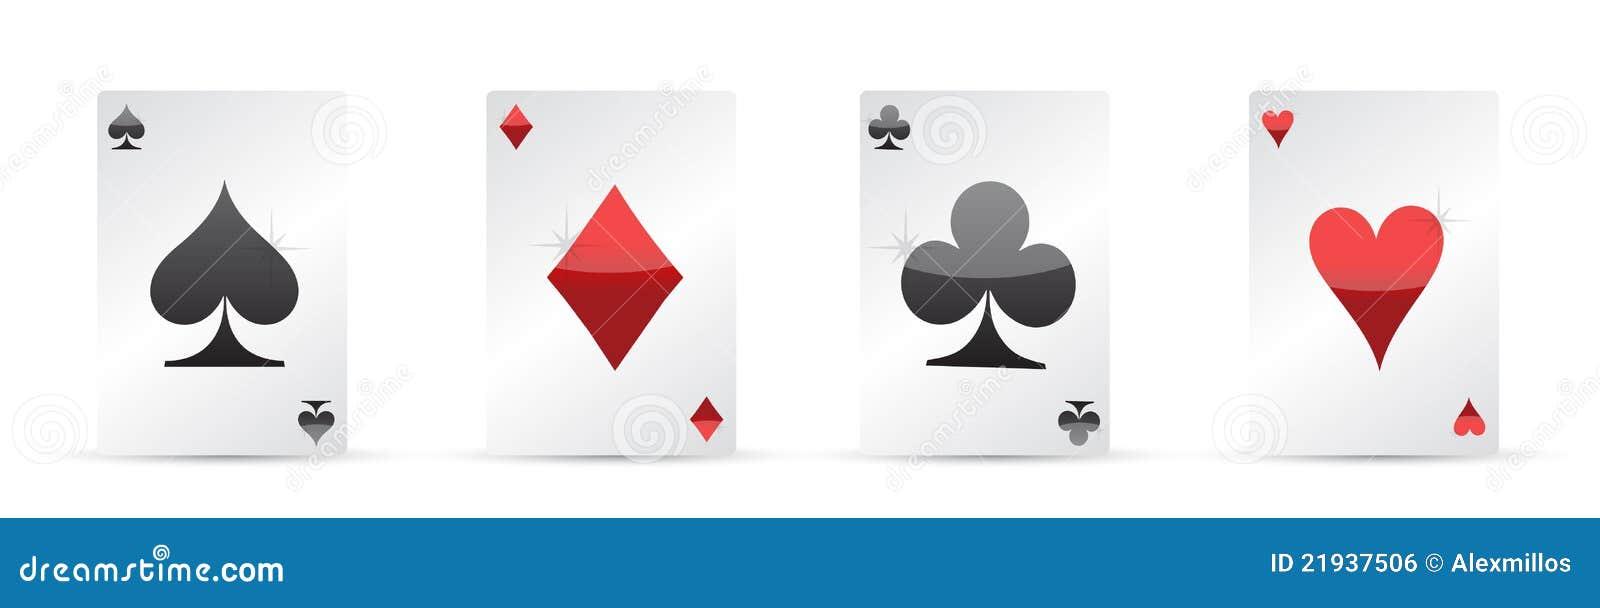 play 4card poker